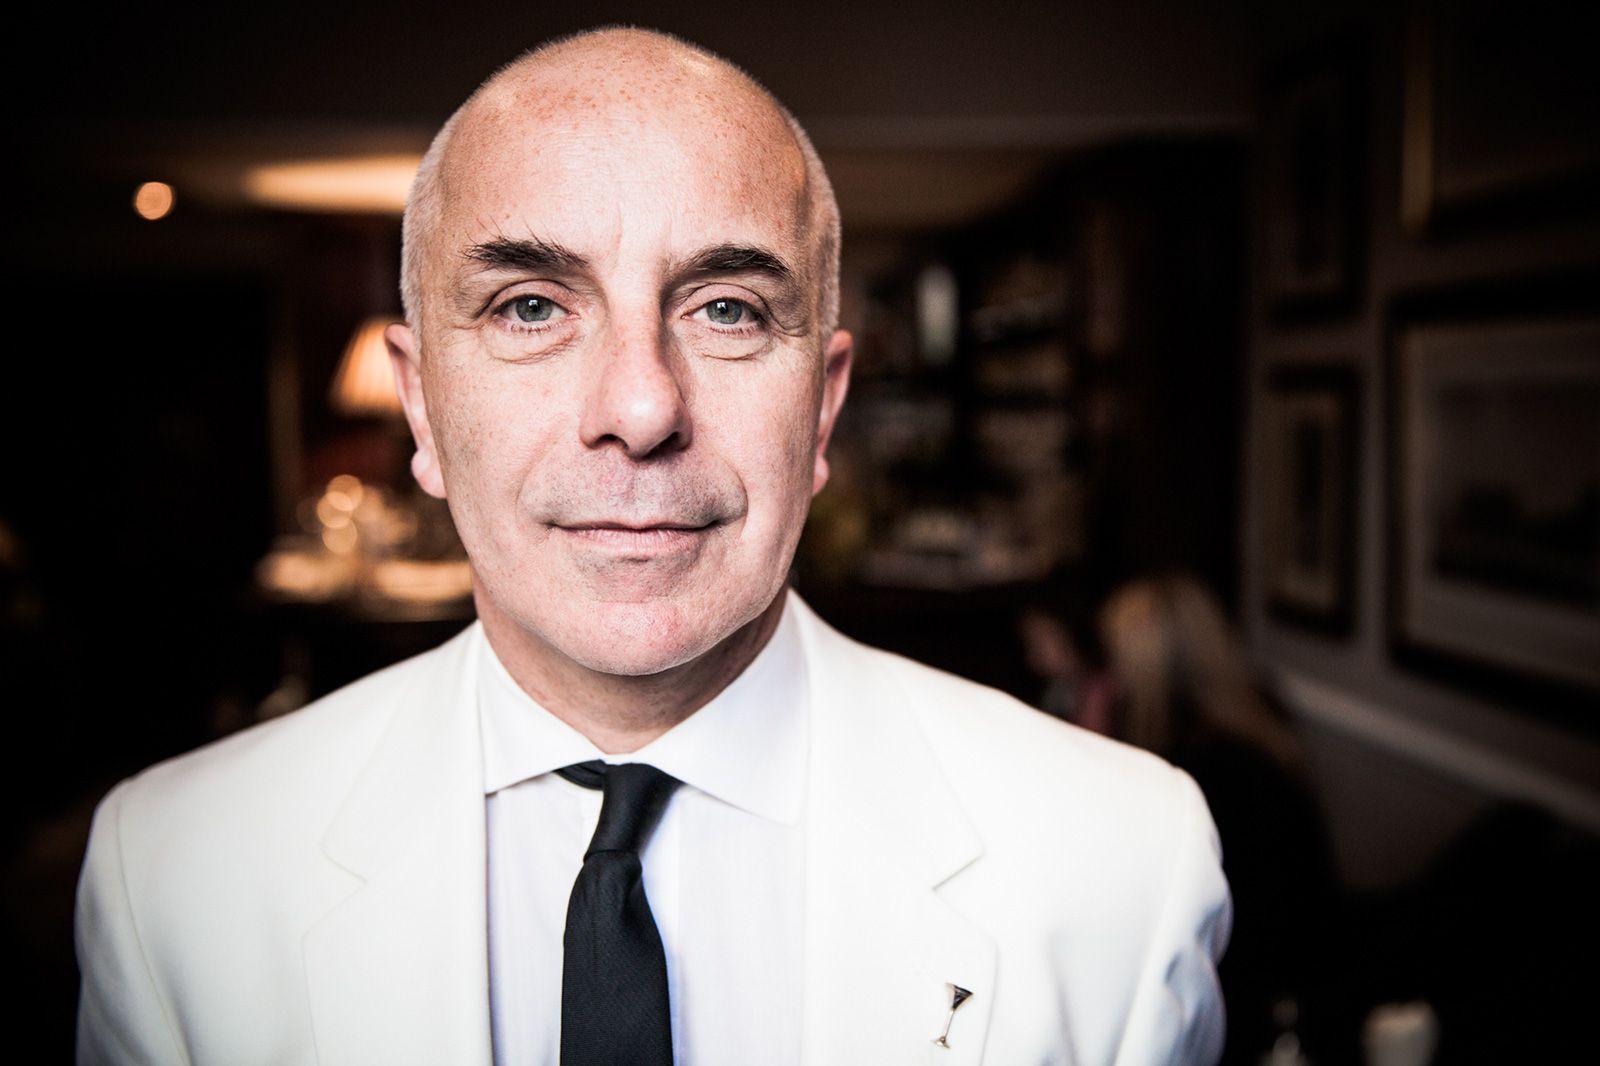 AWARD-WINNING MIXOLOGIST ALESSANDRO PALAZZI TO RECREATE JAMES BOND'S MARTINI MOMENTS AT DUKES DUBAI